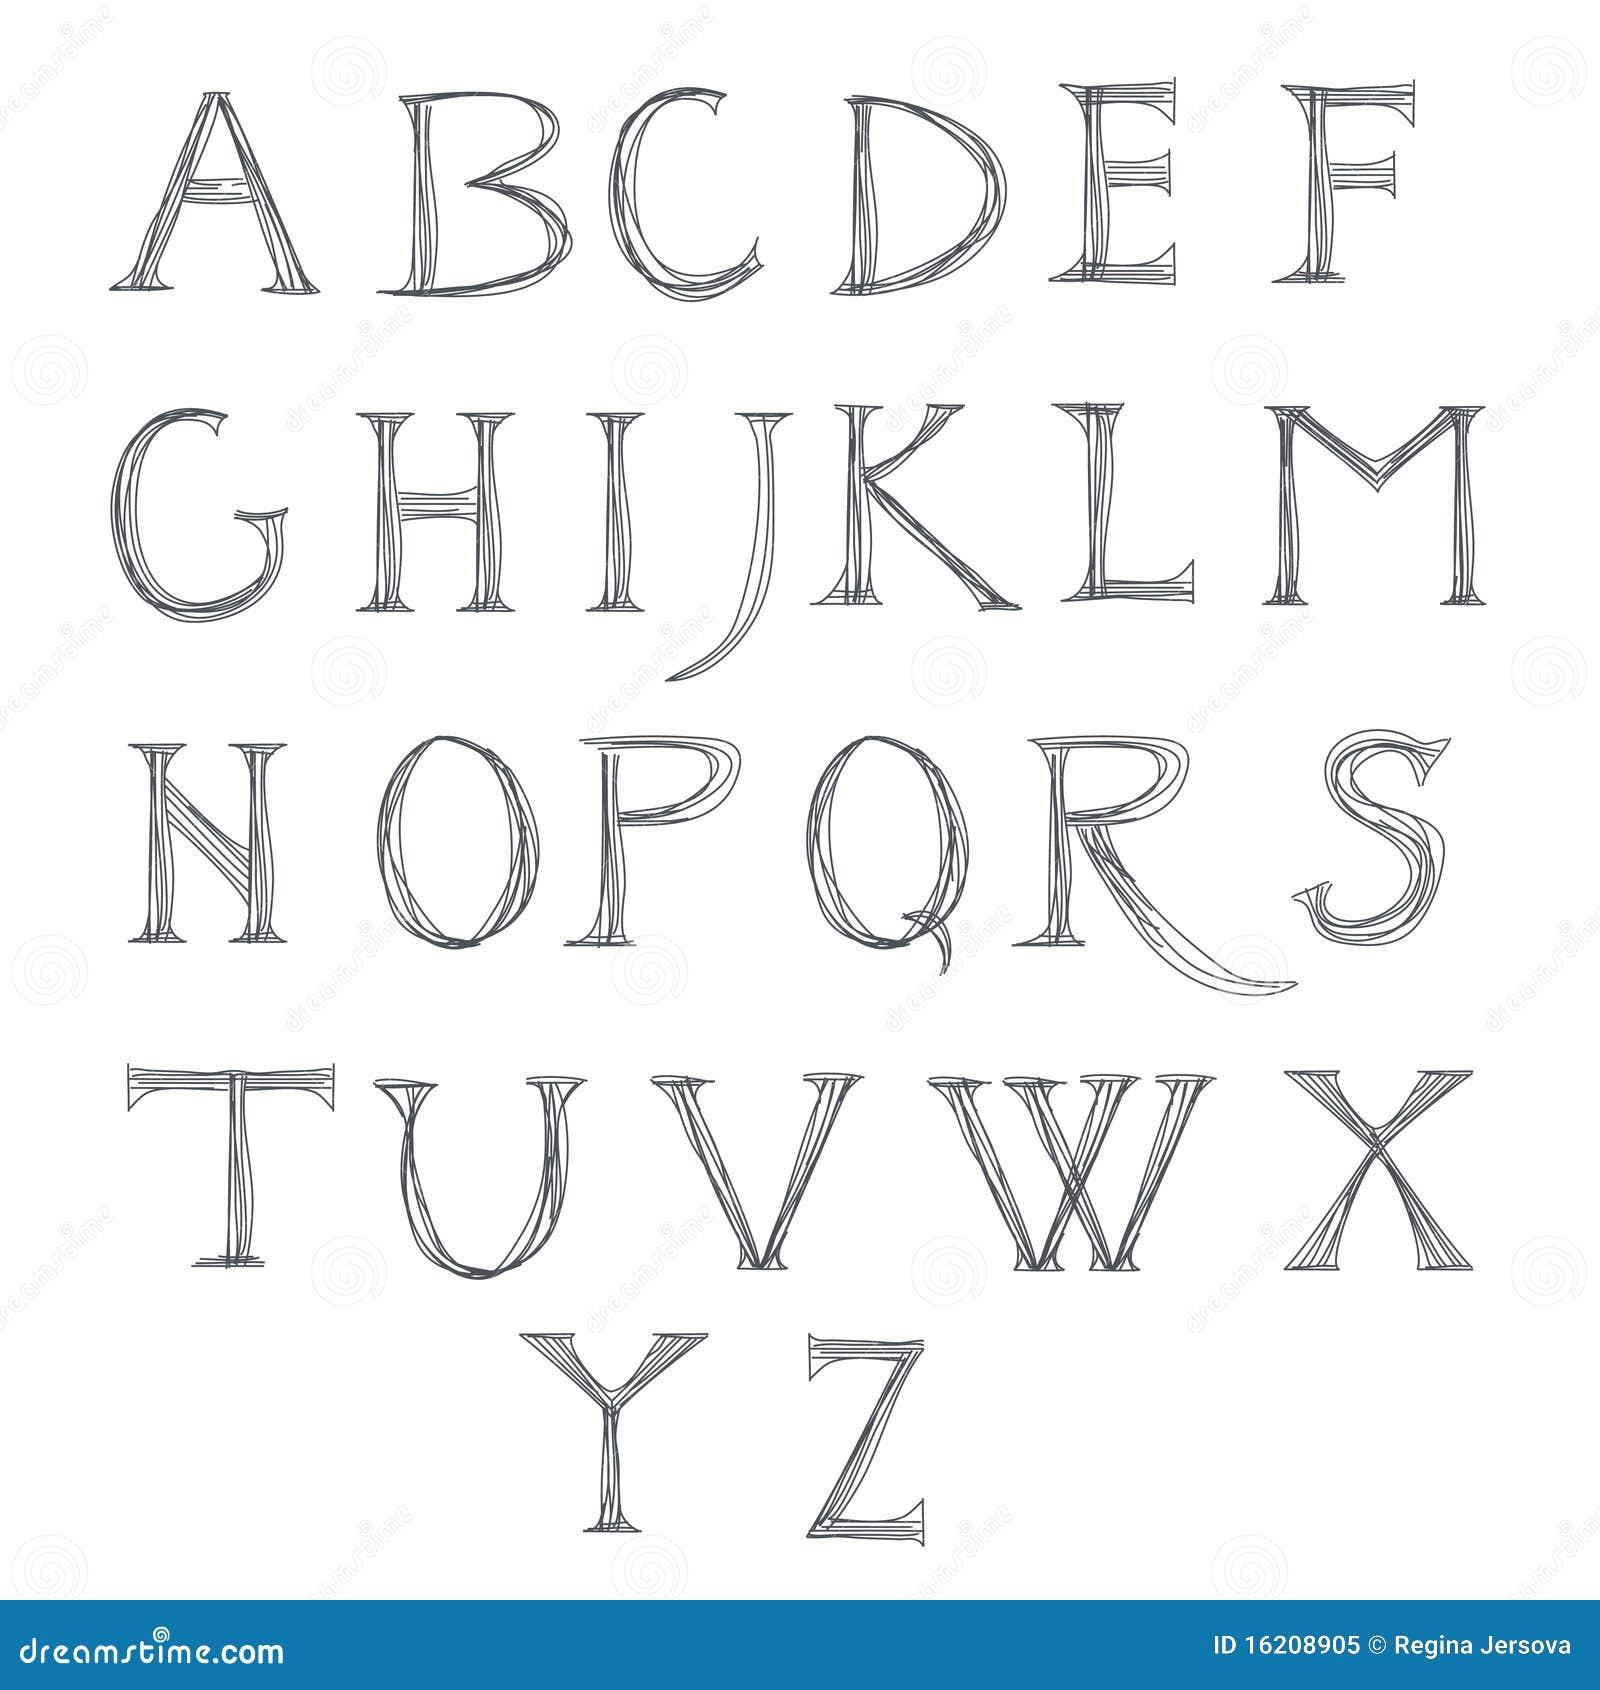 Alphabet Sketch Royalty Free Stock Photo Image 16208905